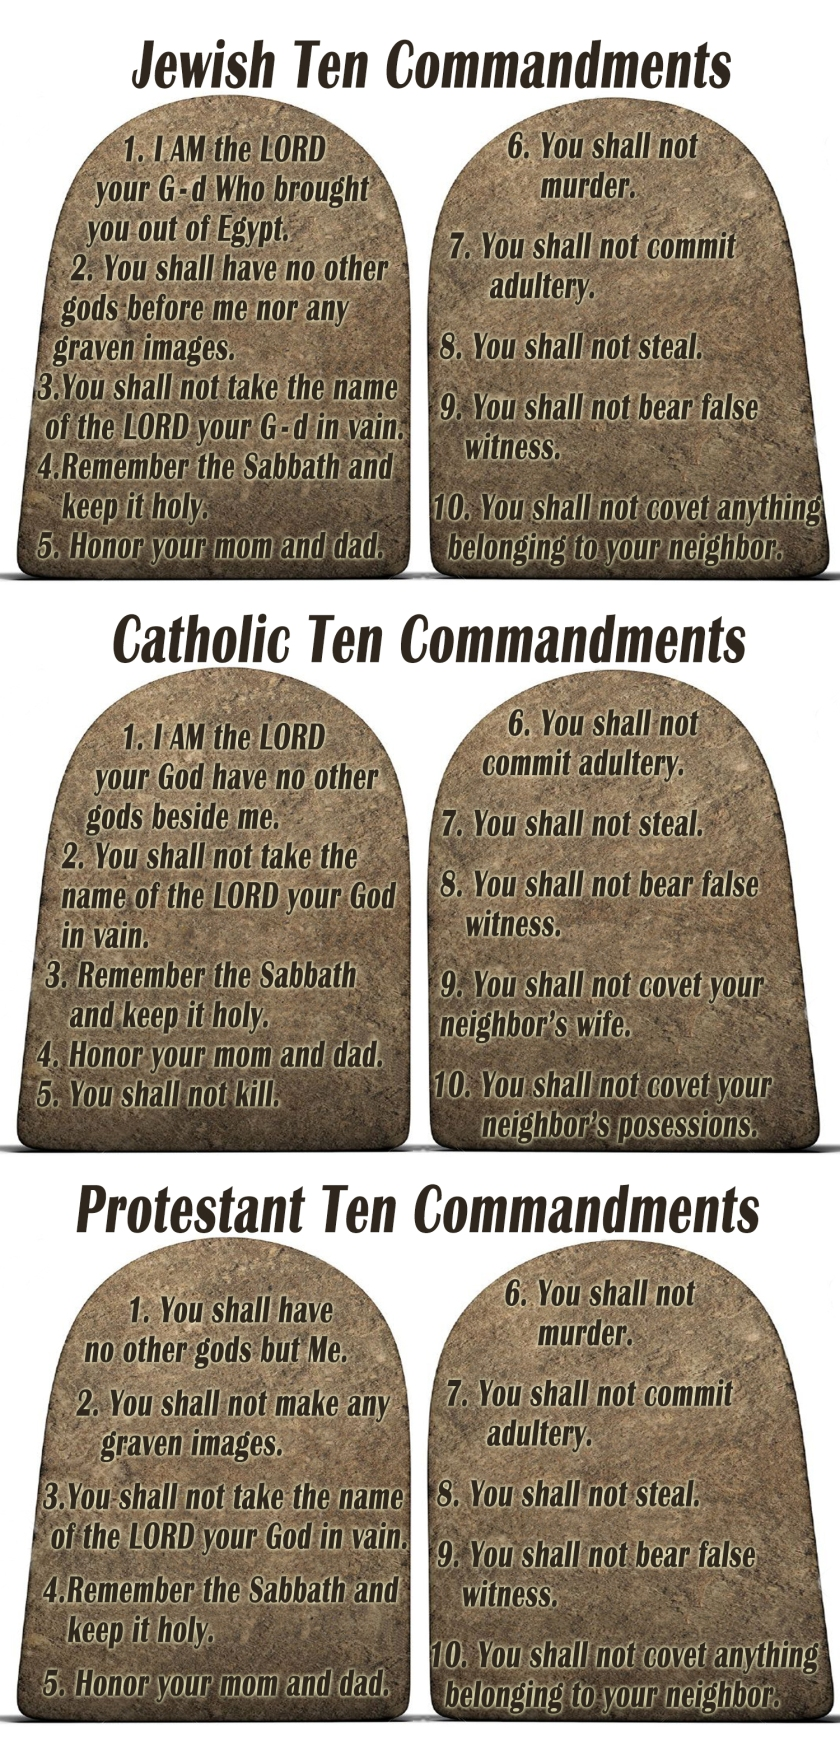 Ten Commandments - Jewish Catholic and Protestant.jpg